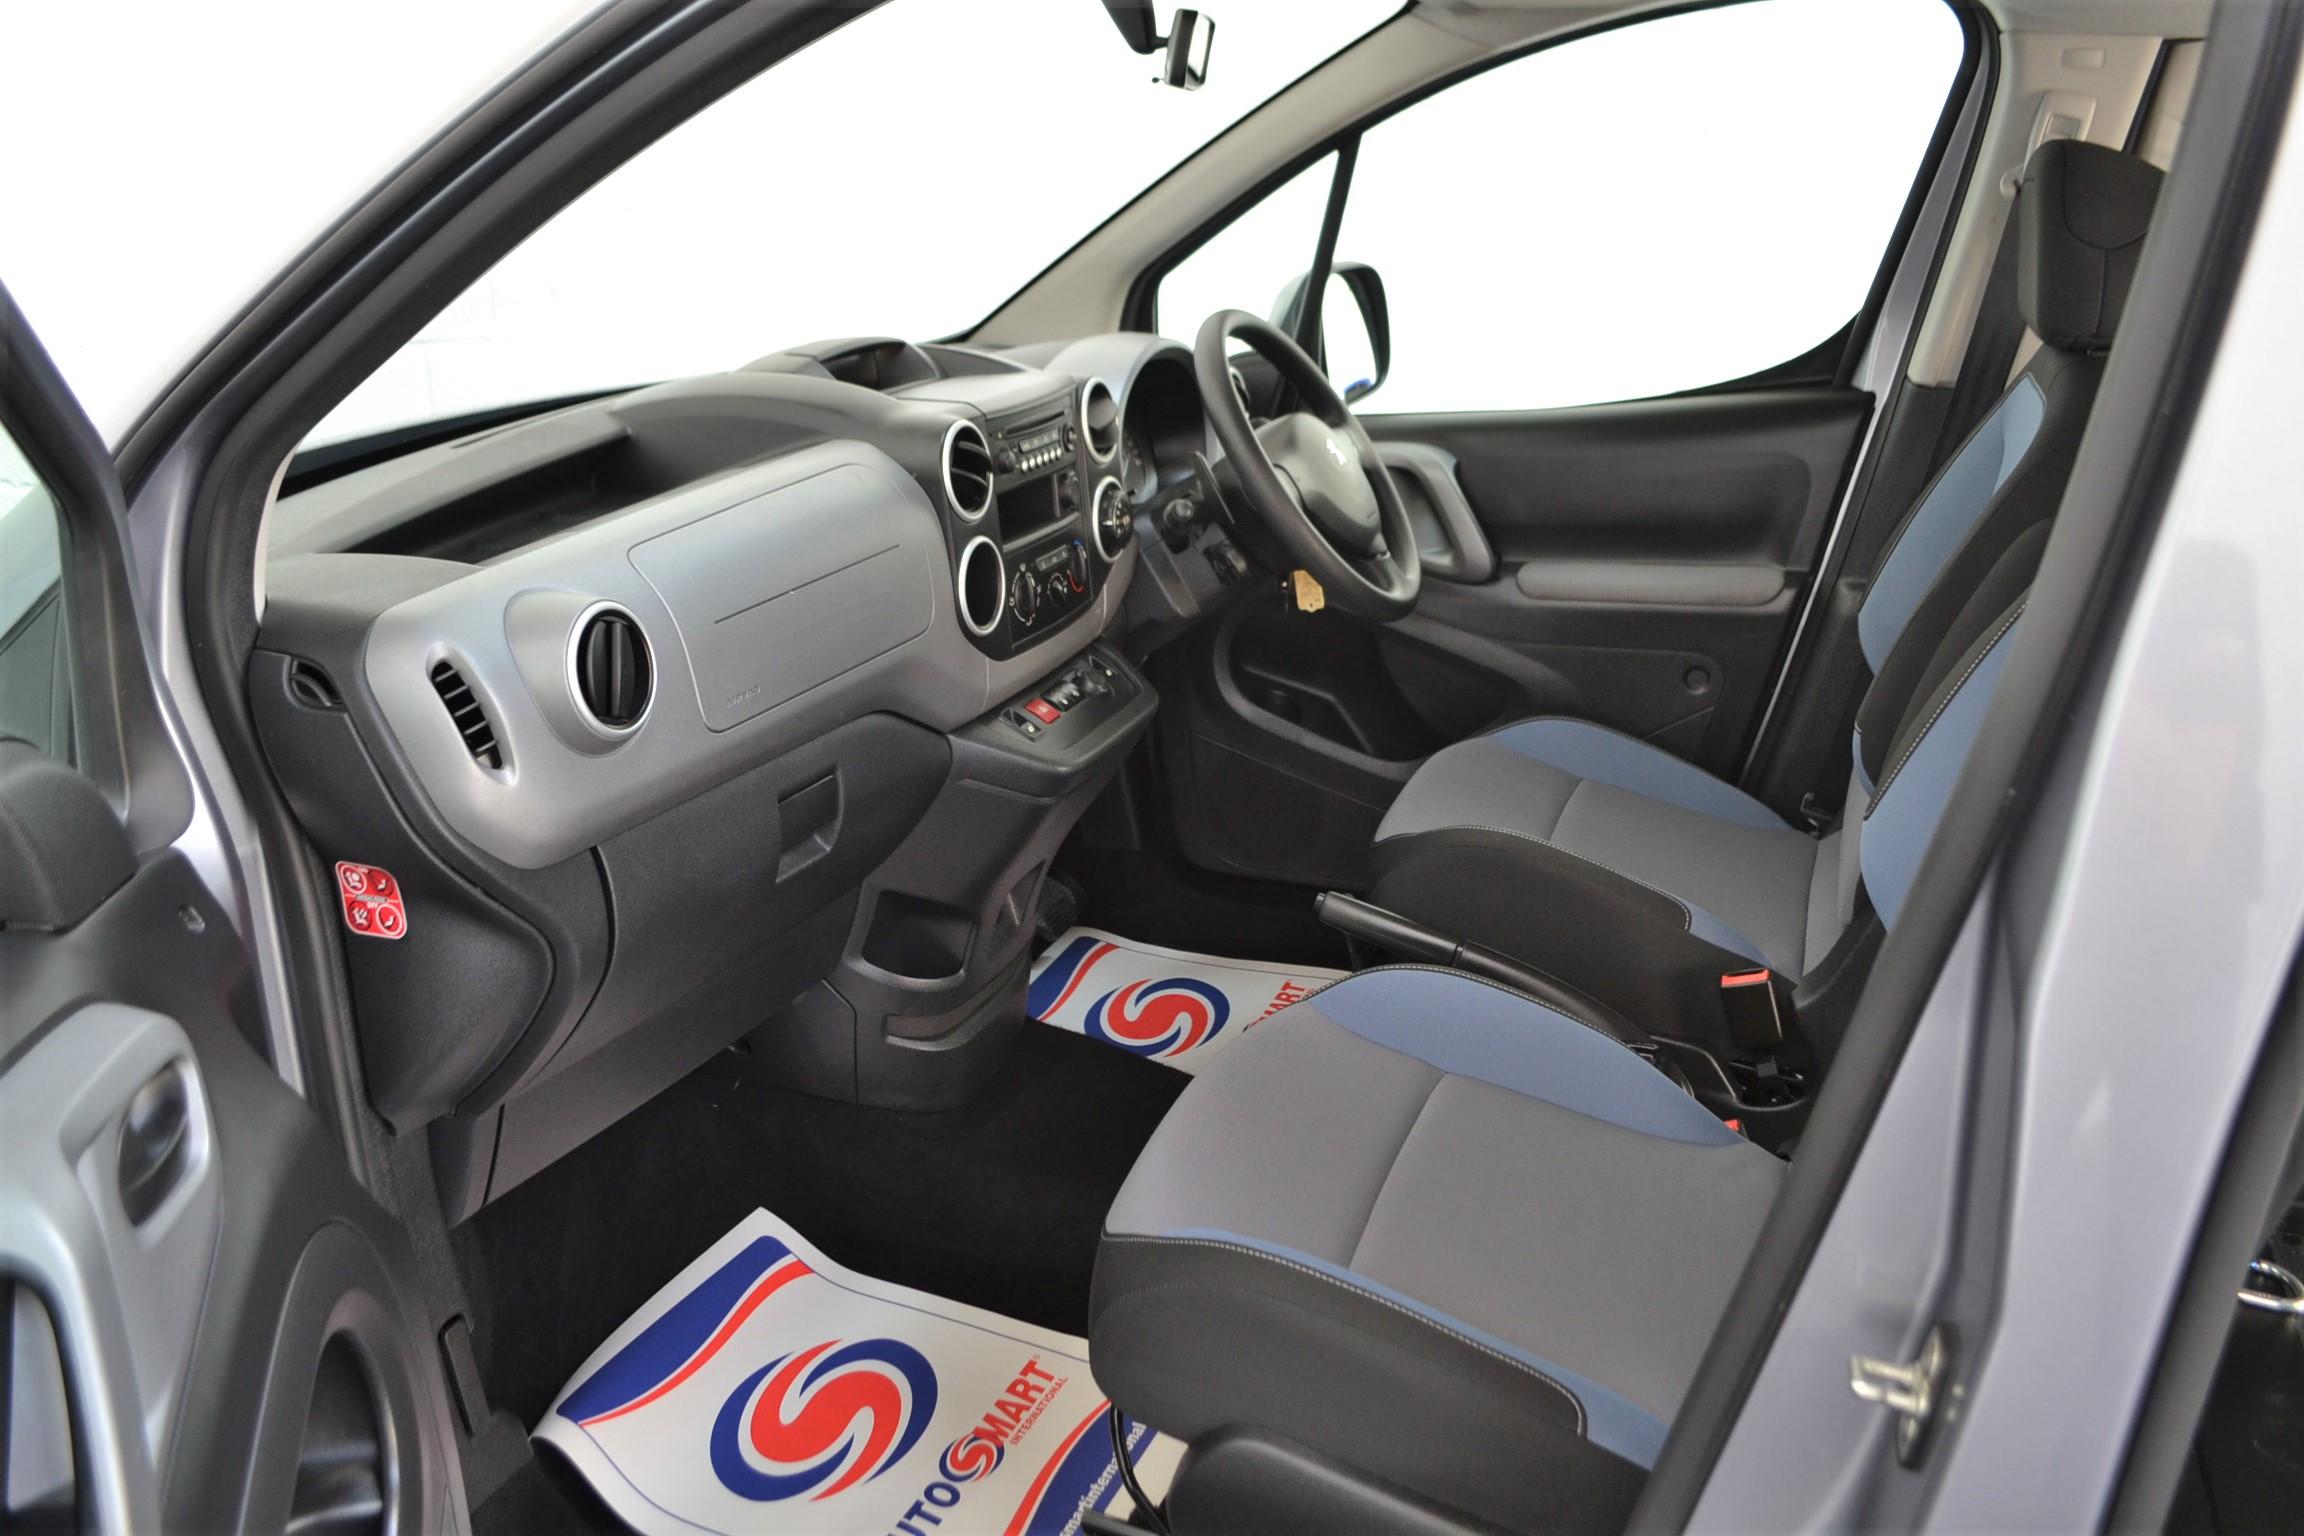 WAV Cars For Sale Bristol Wheelchair Accessible Vehicles Used For Sale Somerset Devon Dorset Bath Peugeot Partner Auto 11